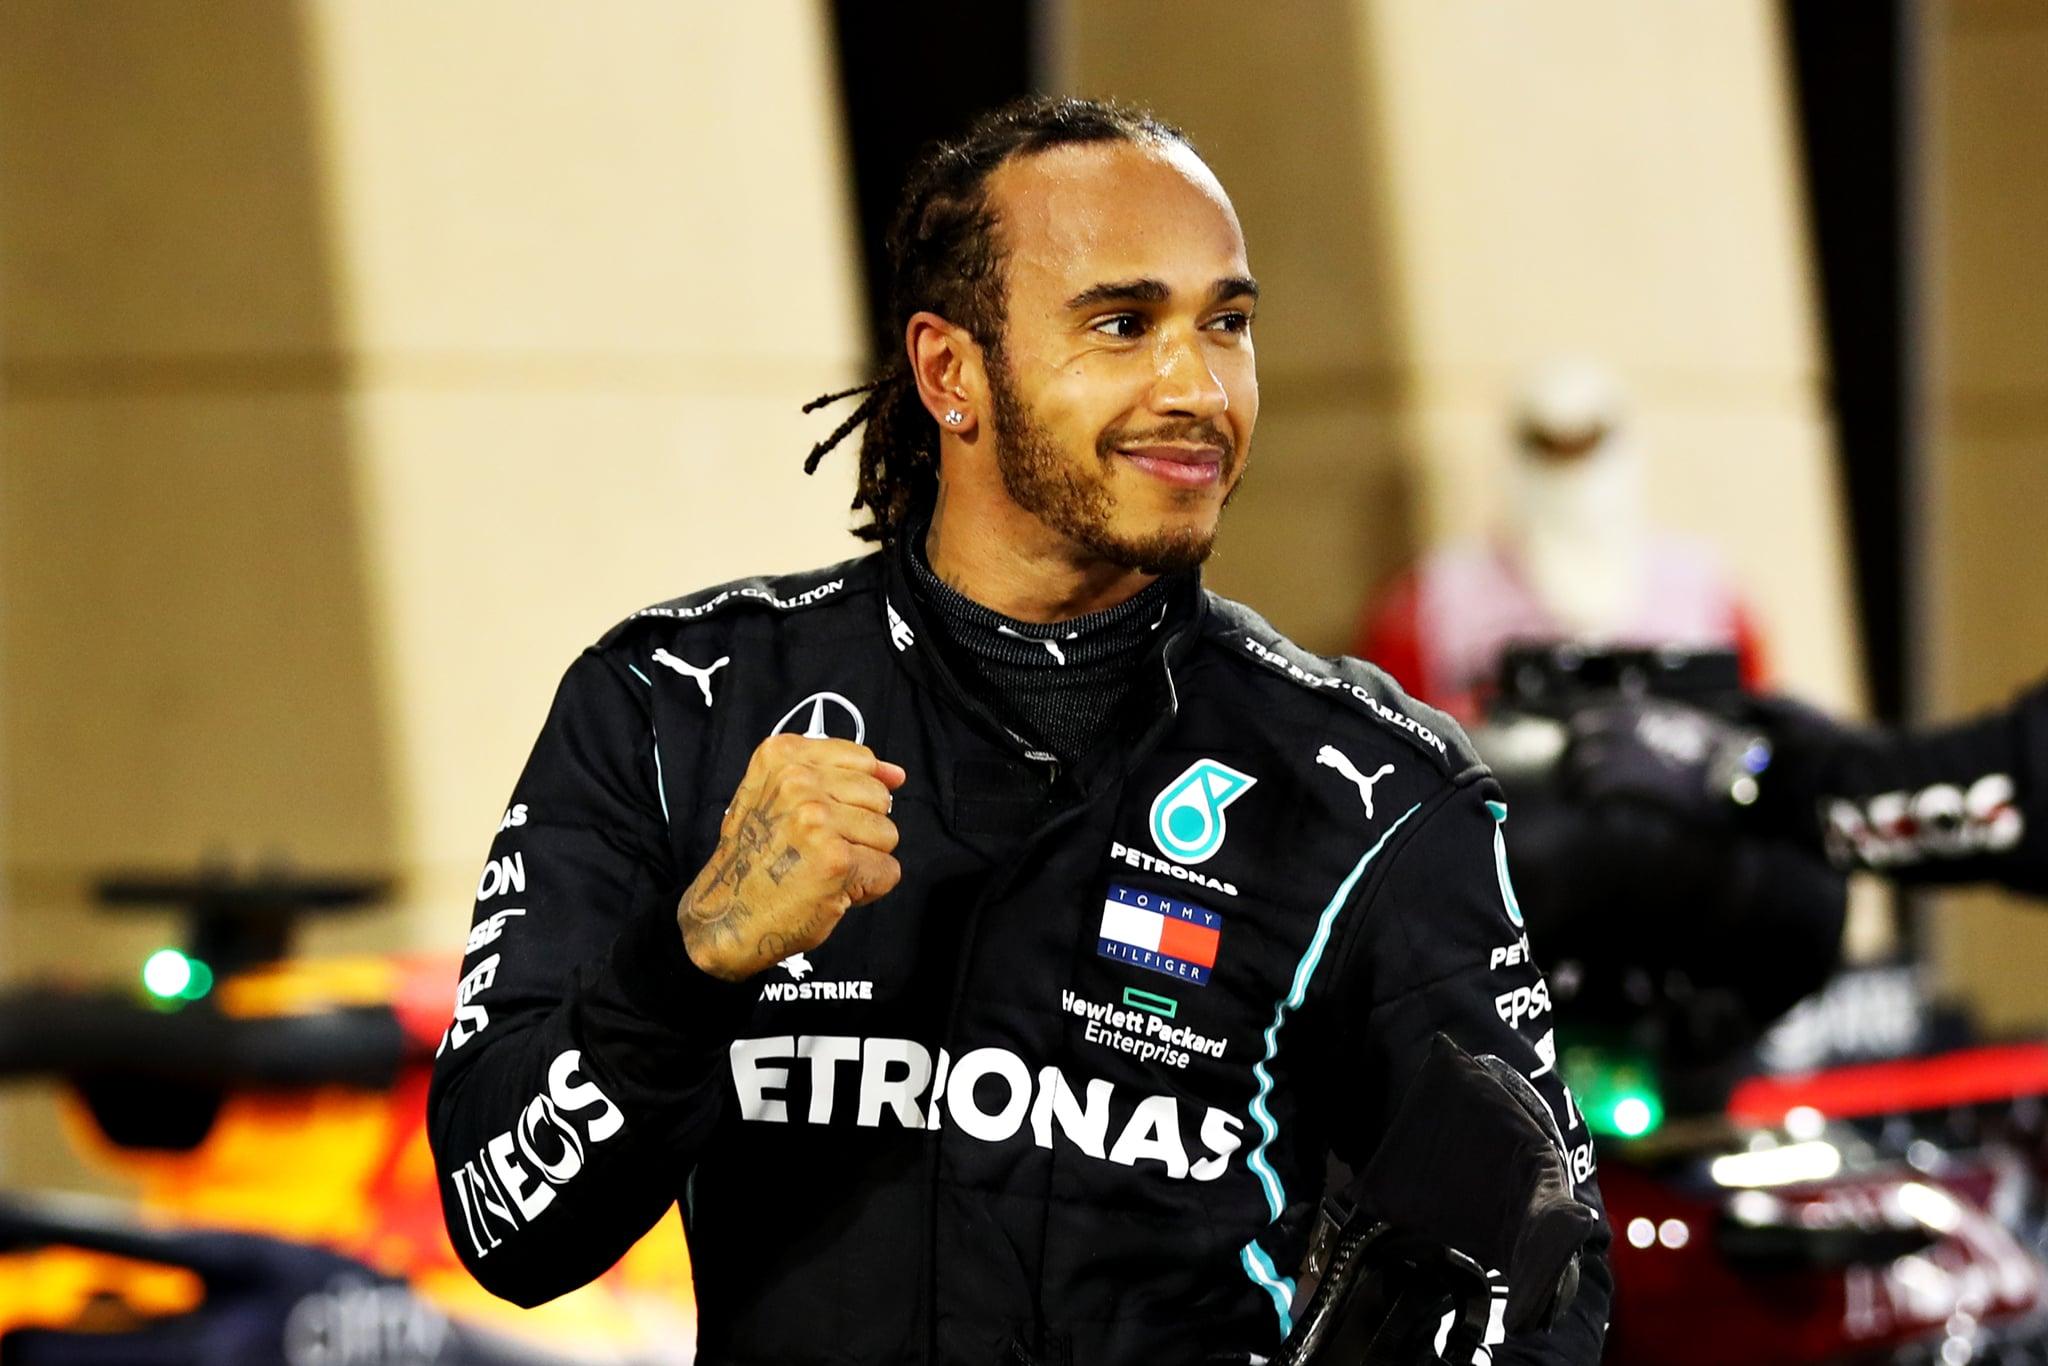 BAHRAIN, BAHRAIN - NOVEMBER 29: Race winner Lewis Hamilton of Great Britain and Mercedes GP celebrates in parc ferme during the F1 Grand Prix of Bahrain at Bahrain International Circuit on November 29, 2020 in Bahrain, Bahrain. (Photo by Mark Thompson/Getty Images)